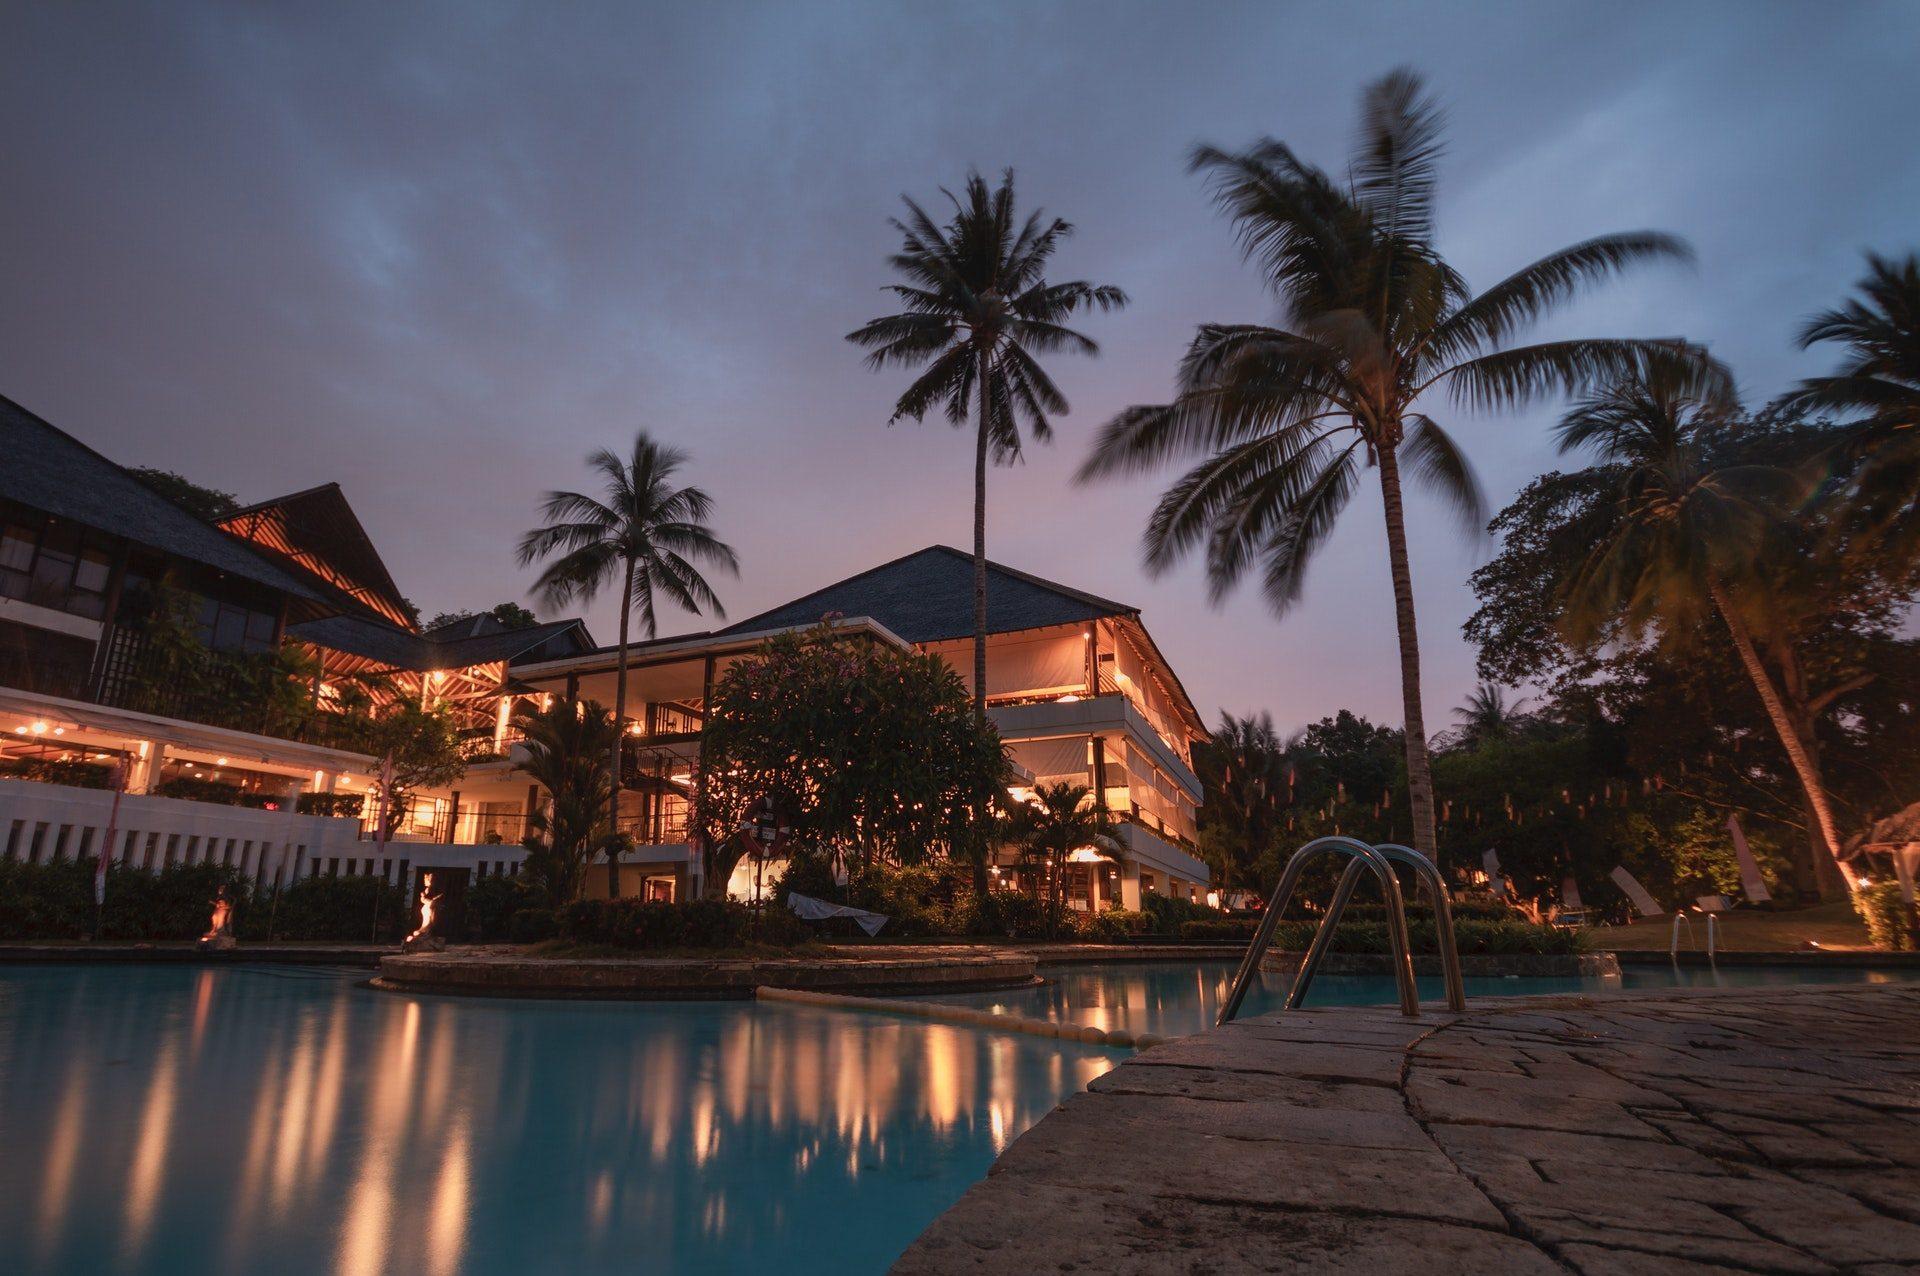 palm-trees-at-night-258154